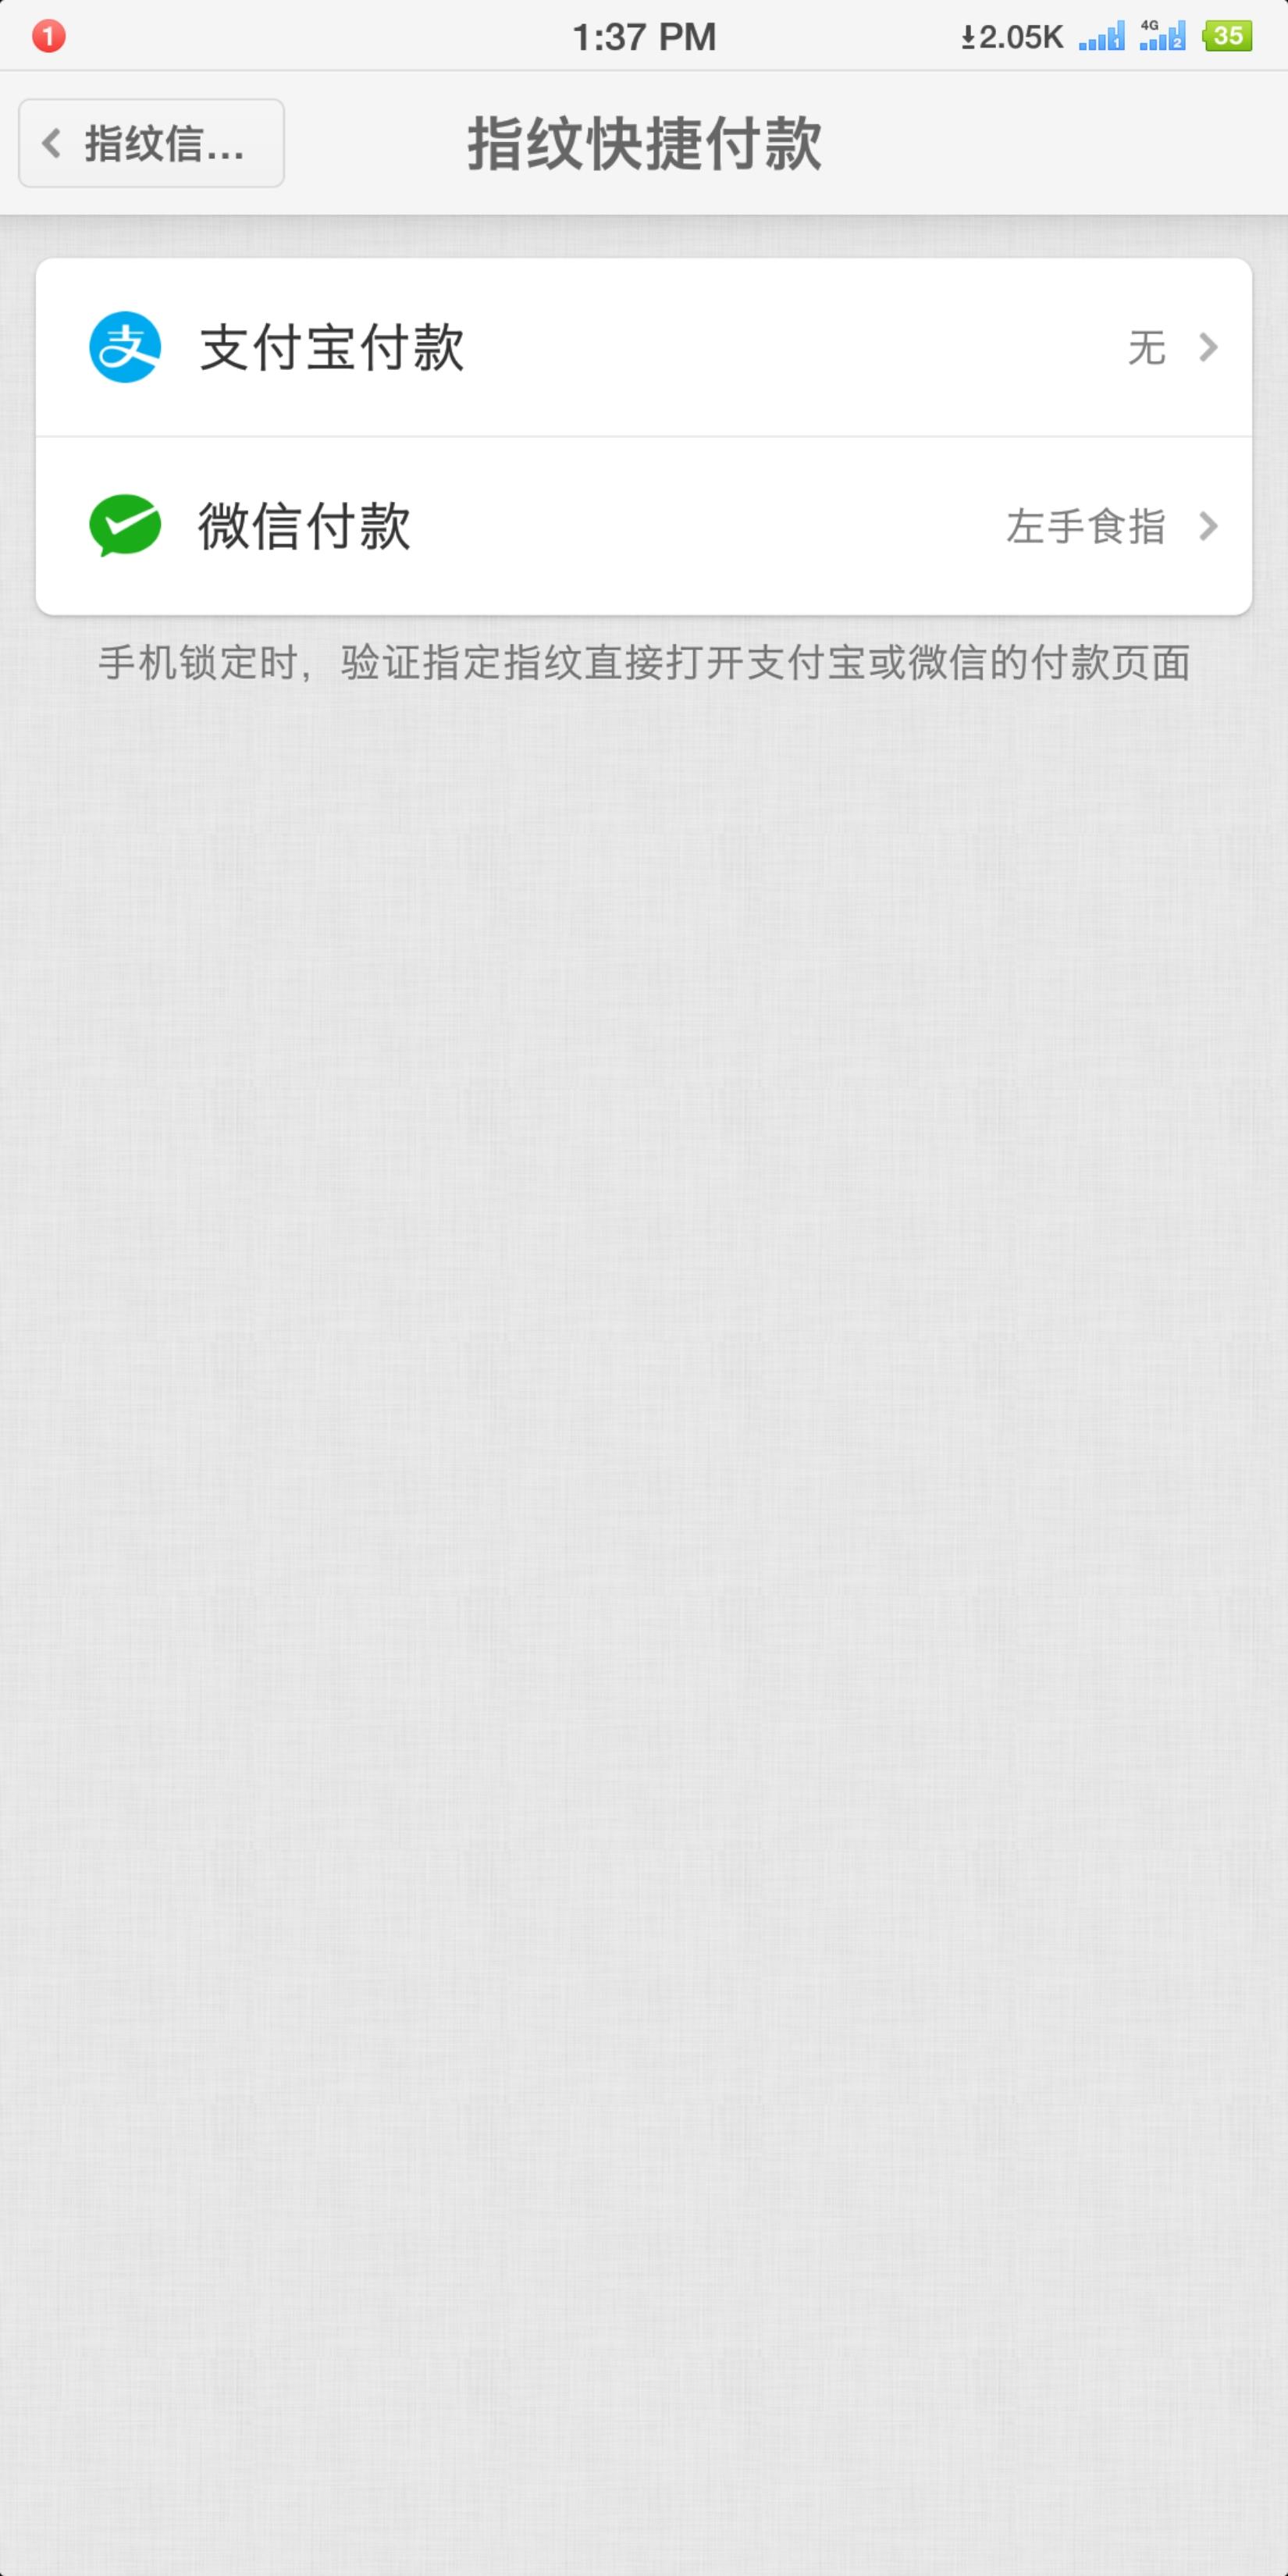 Screenshot_2018-12-03-13-37-22-961_??.png